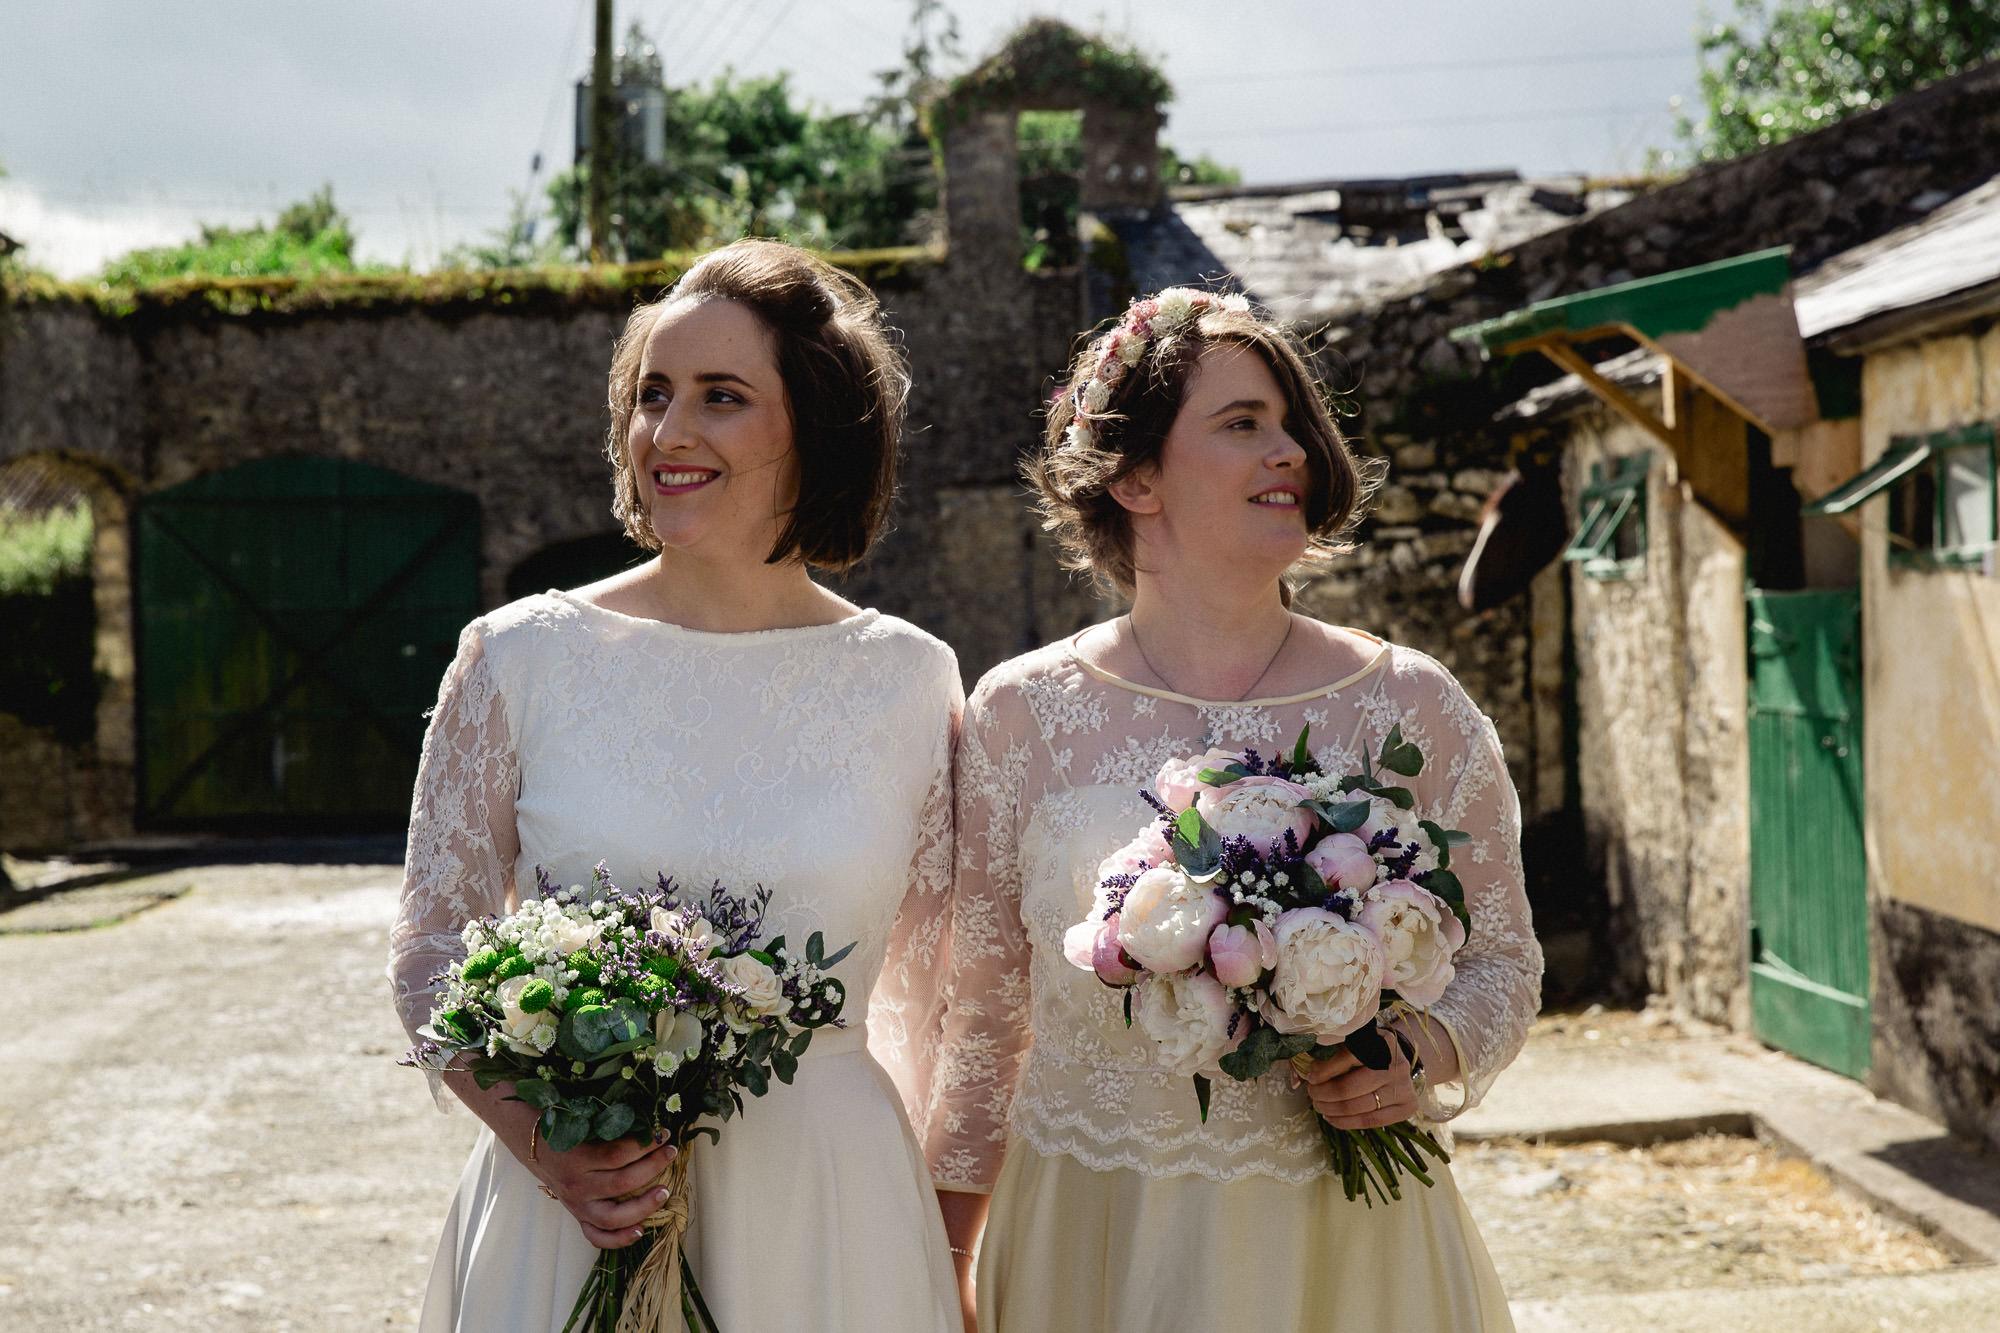 CLAIREBYRNEPHOTOGRAPHY-WEDDING-Ireland-cloncody-alternative-fun-Jen-Helena-11.jpg